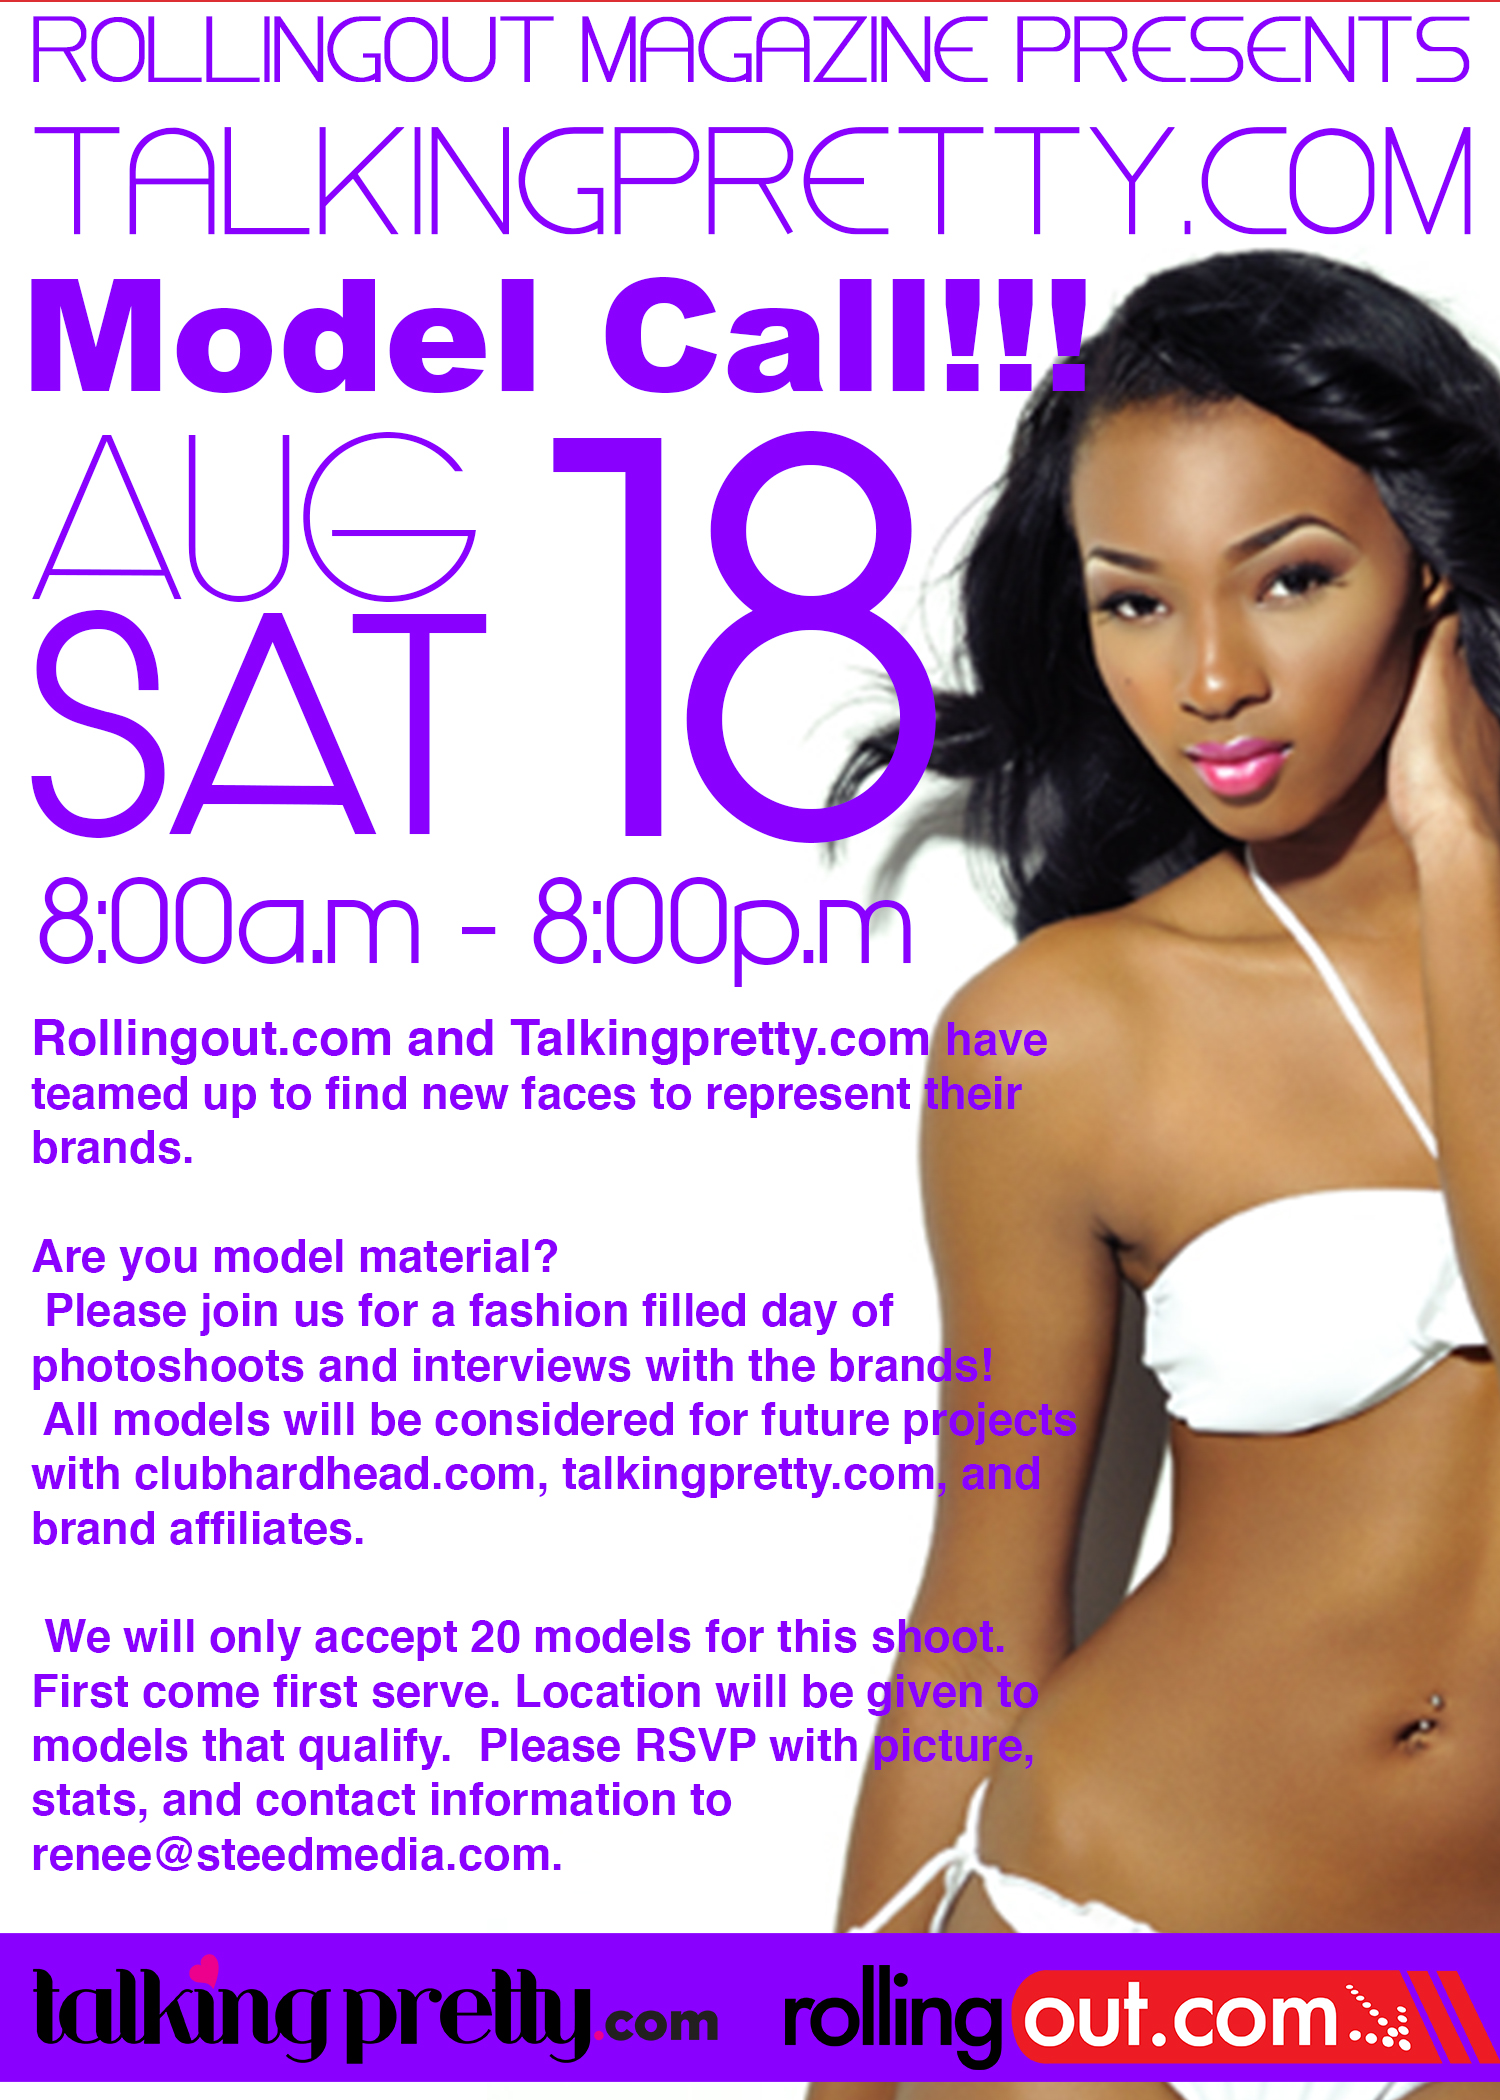 talkingpretty model call